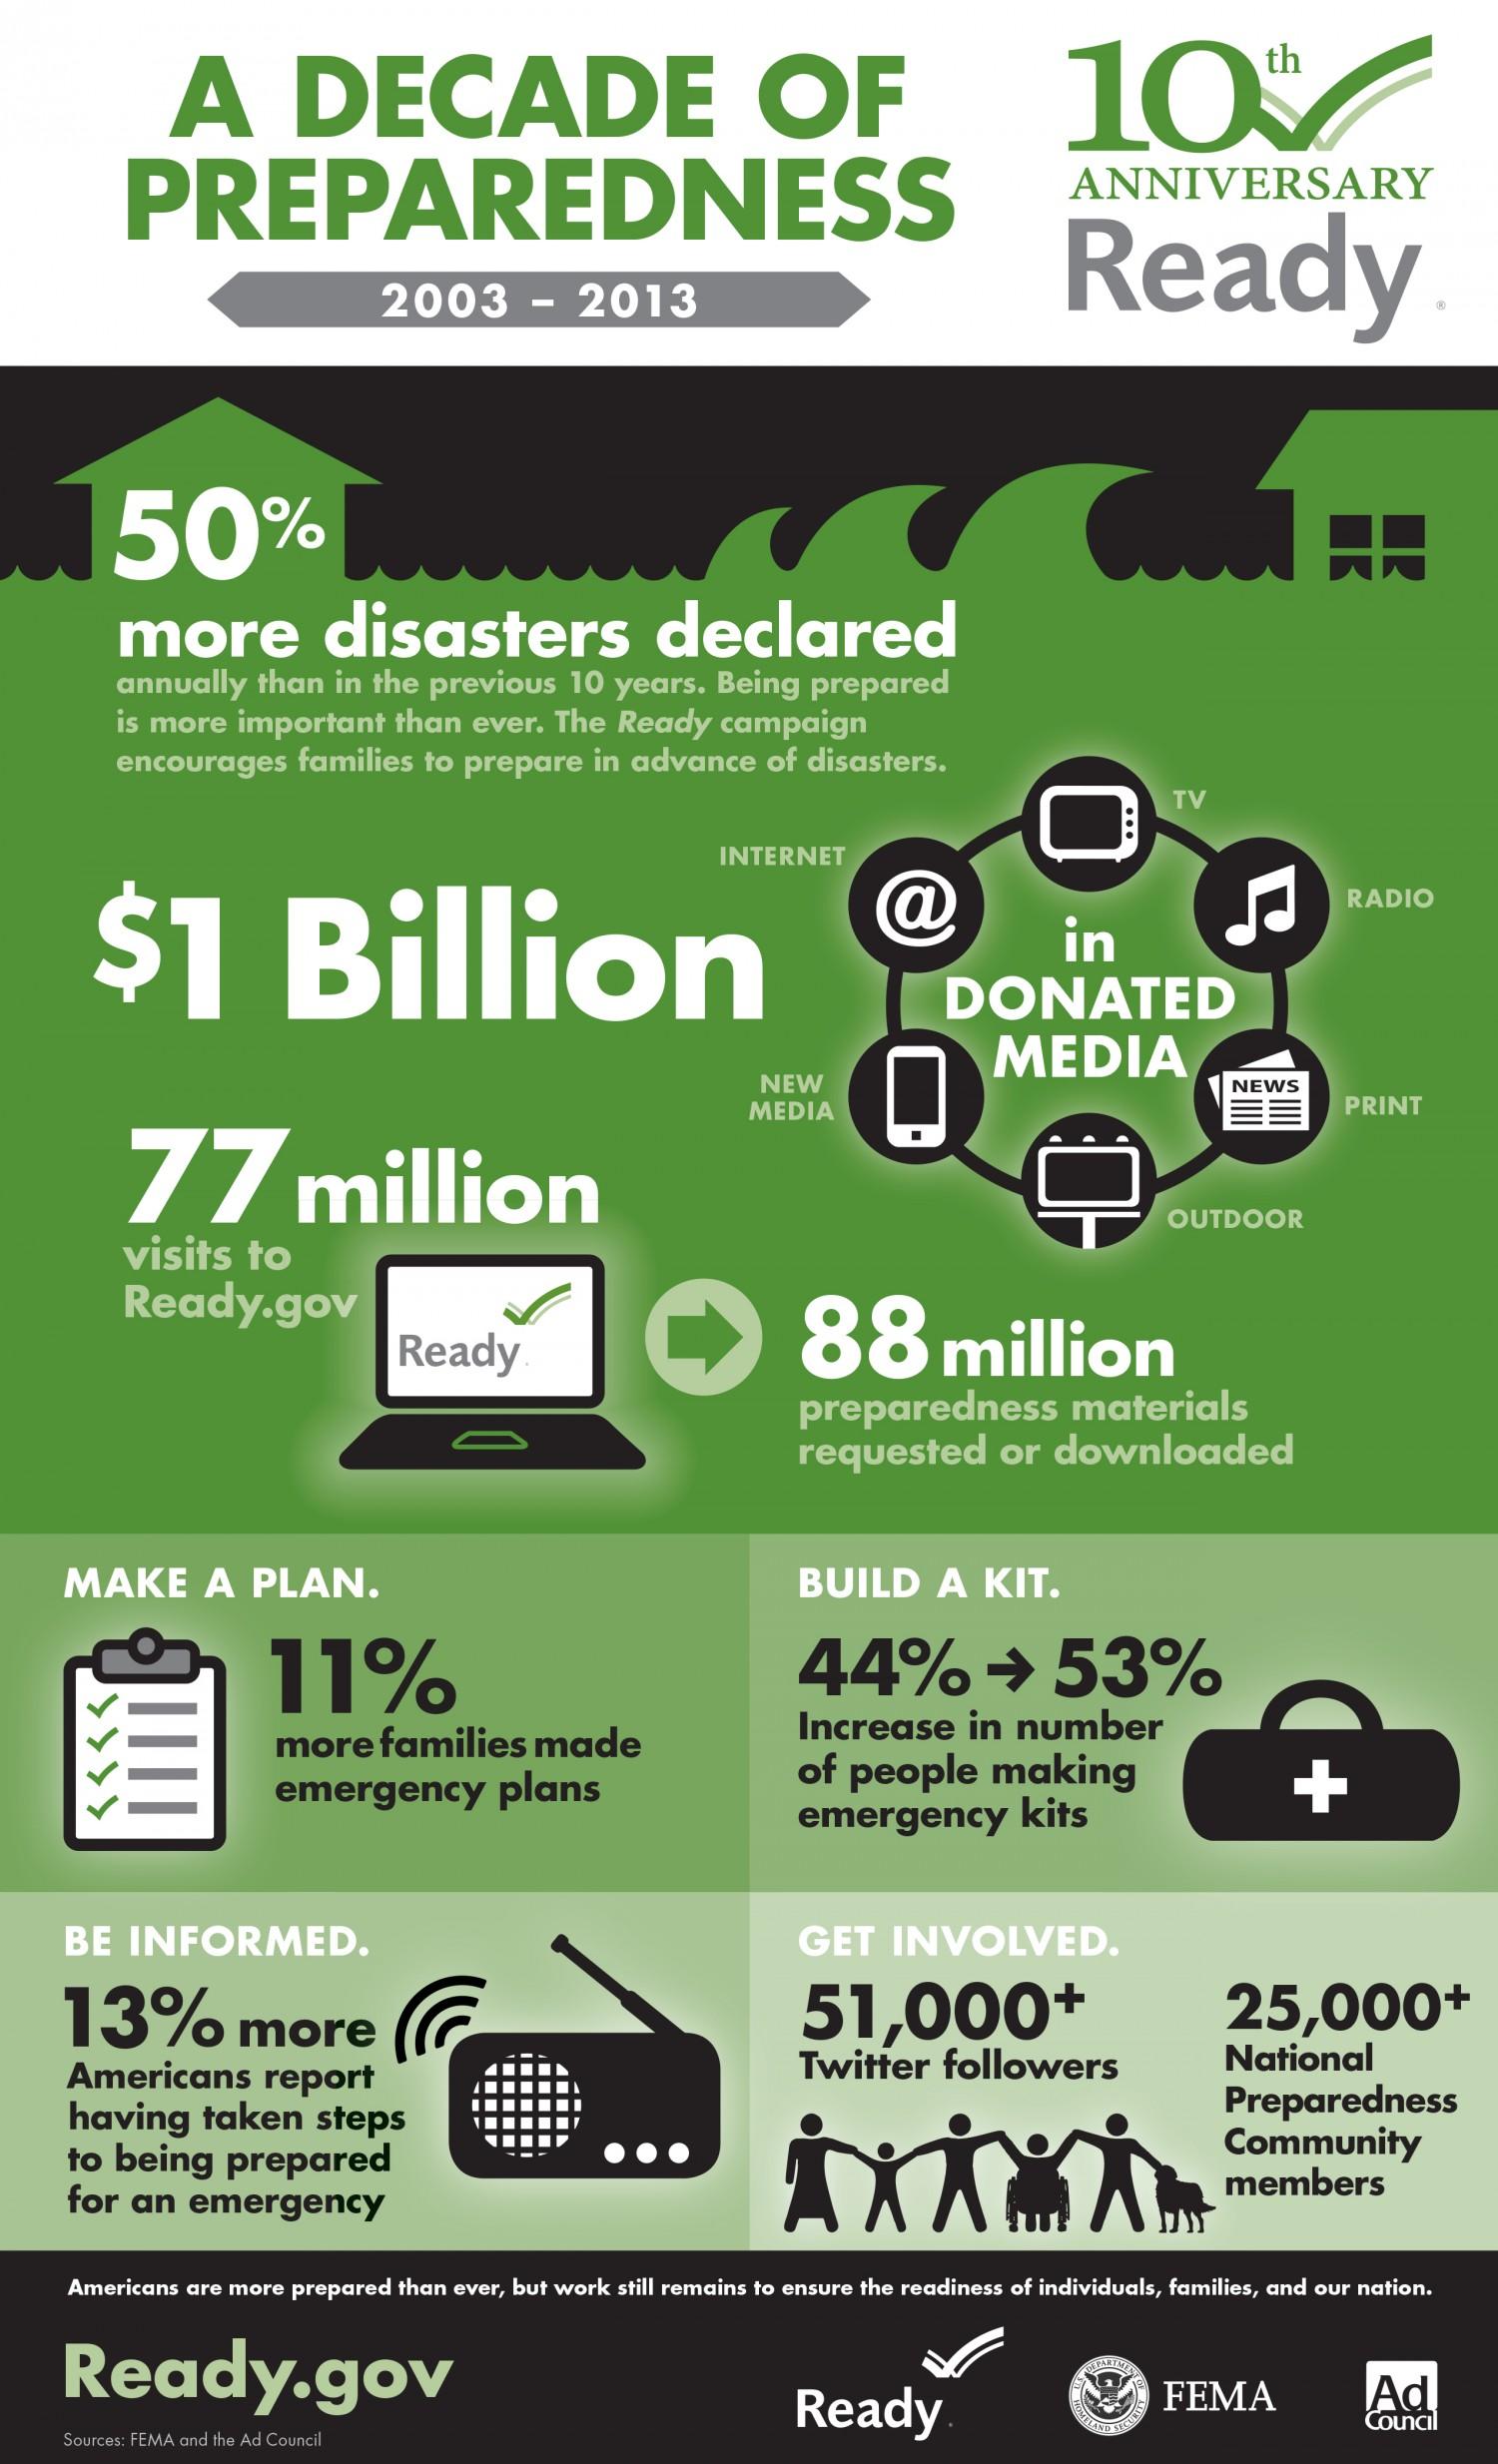 A decade of preparedness